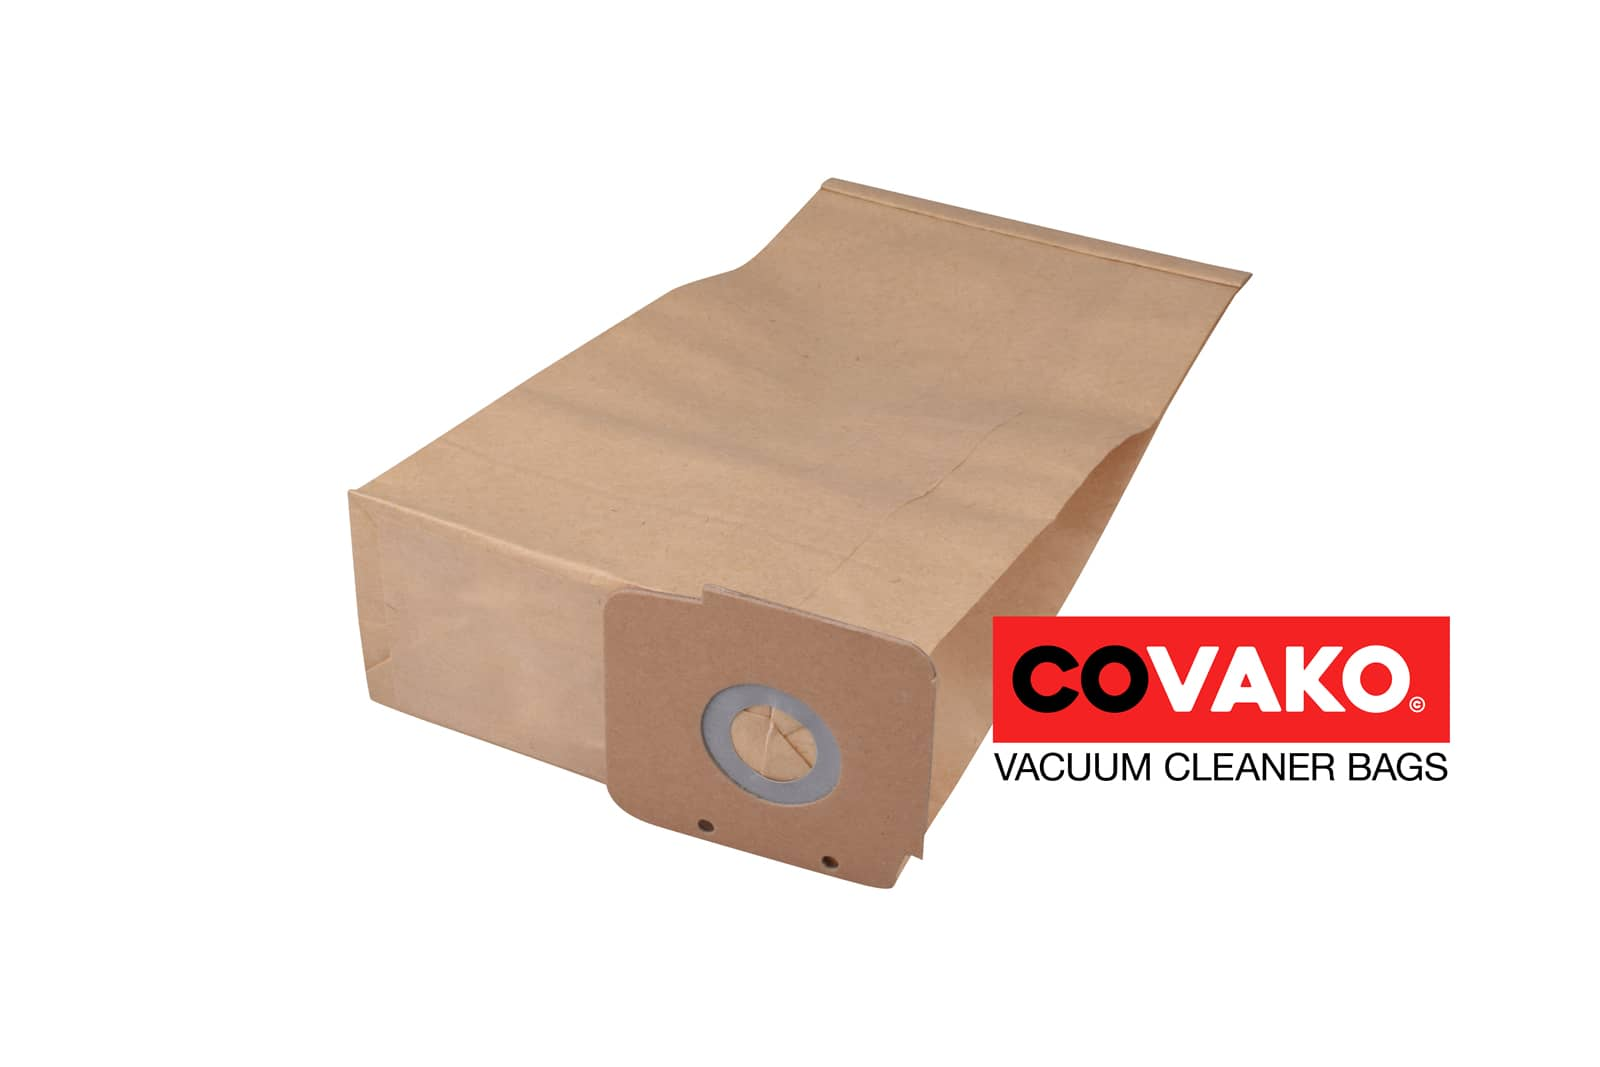 Kärcher CV 30/1 / Paper - Kärcher vacuum cleaner bags